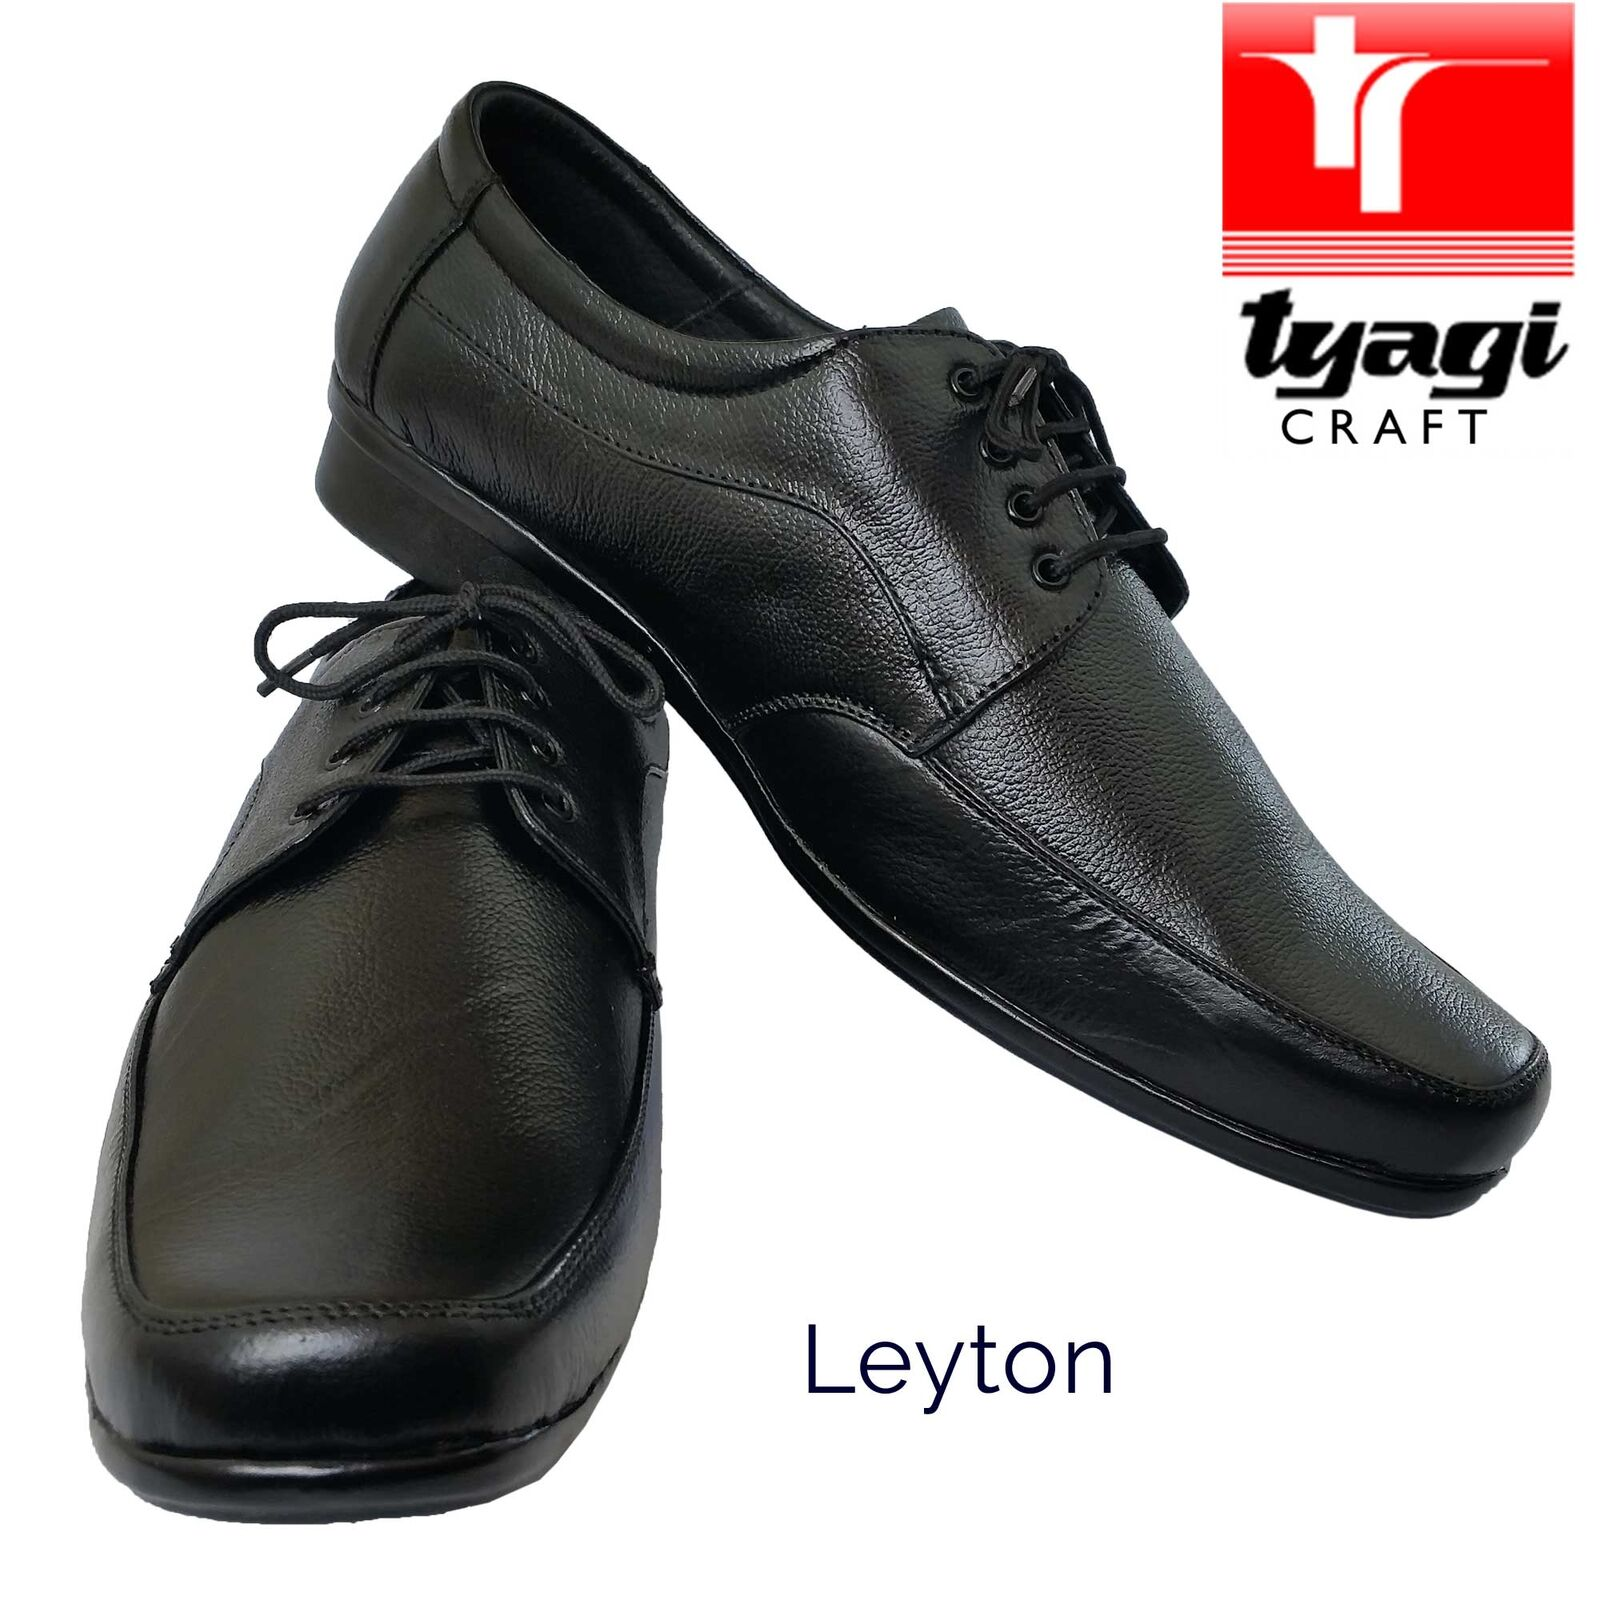 NEW Teenage Boy Size Men Shoes Black Leather Smart All Size Boy Uniform School 9ac135